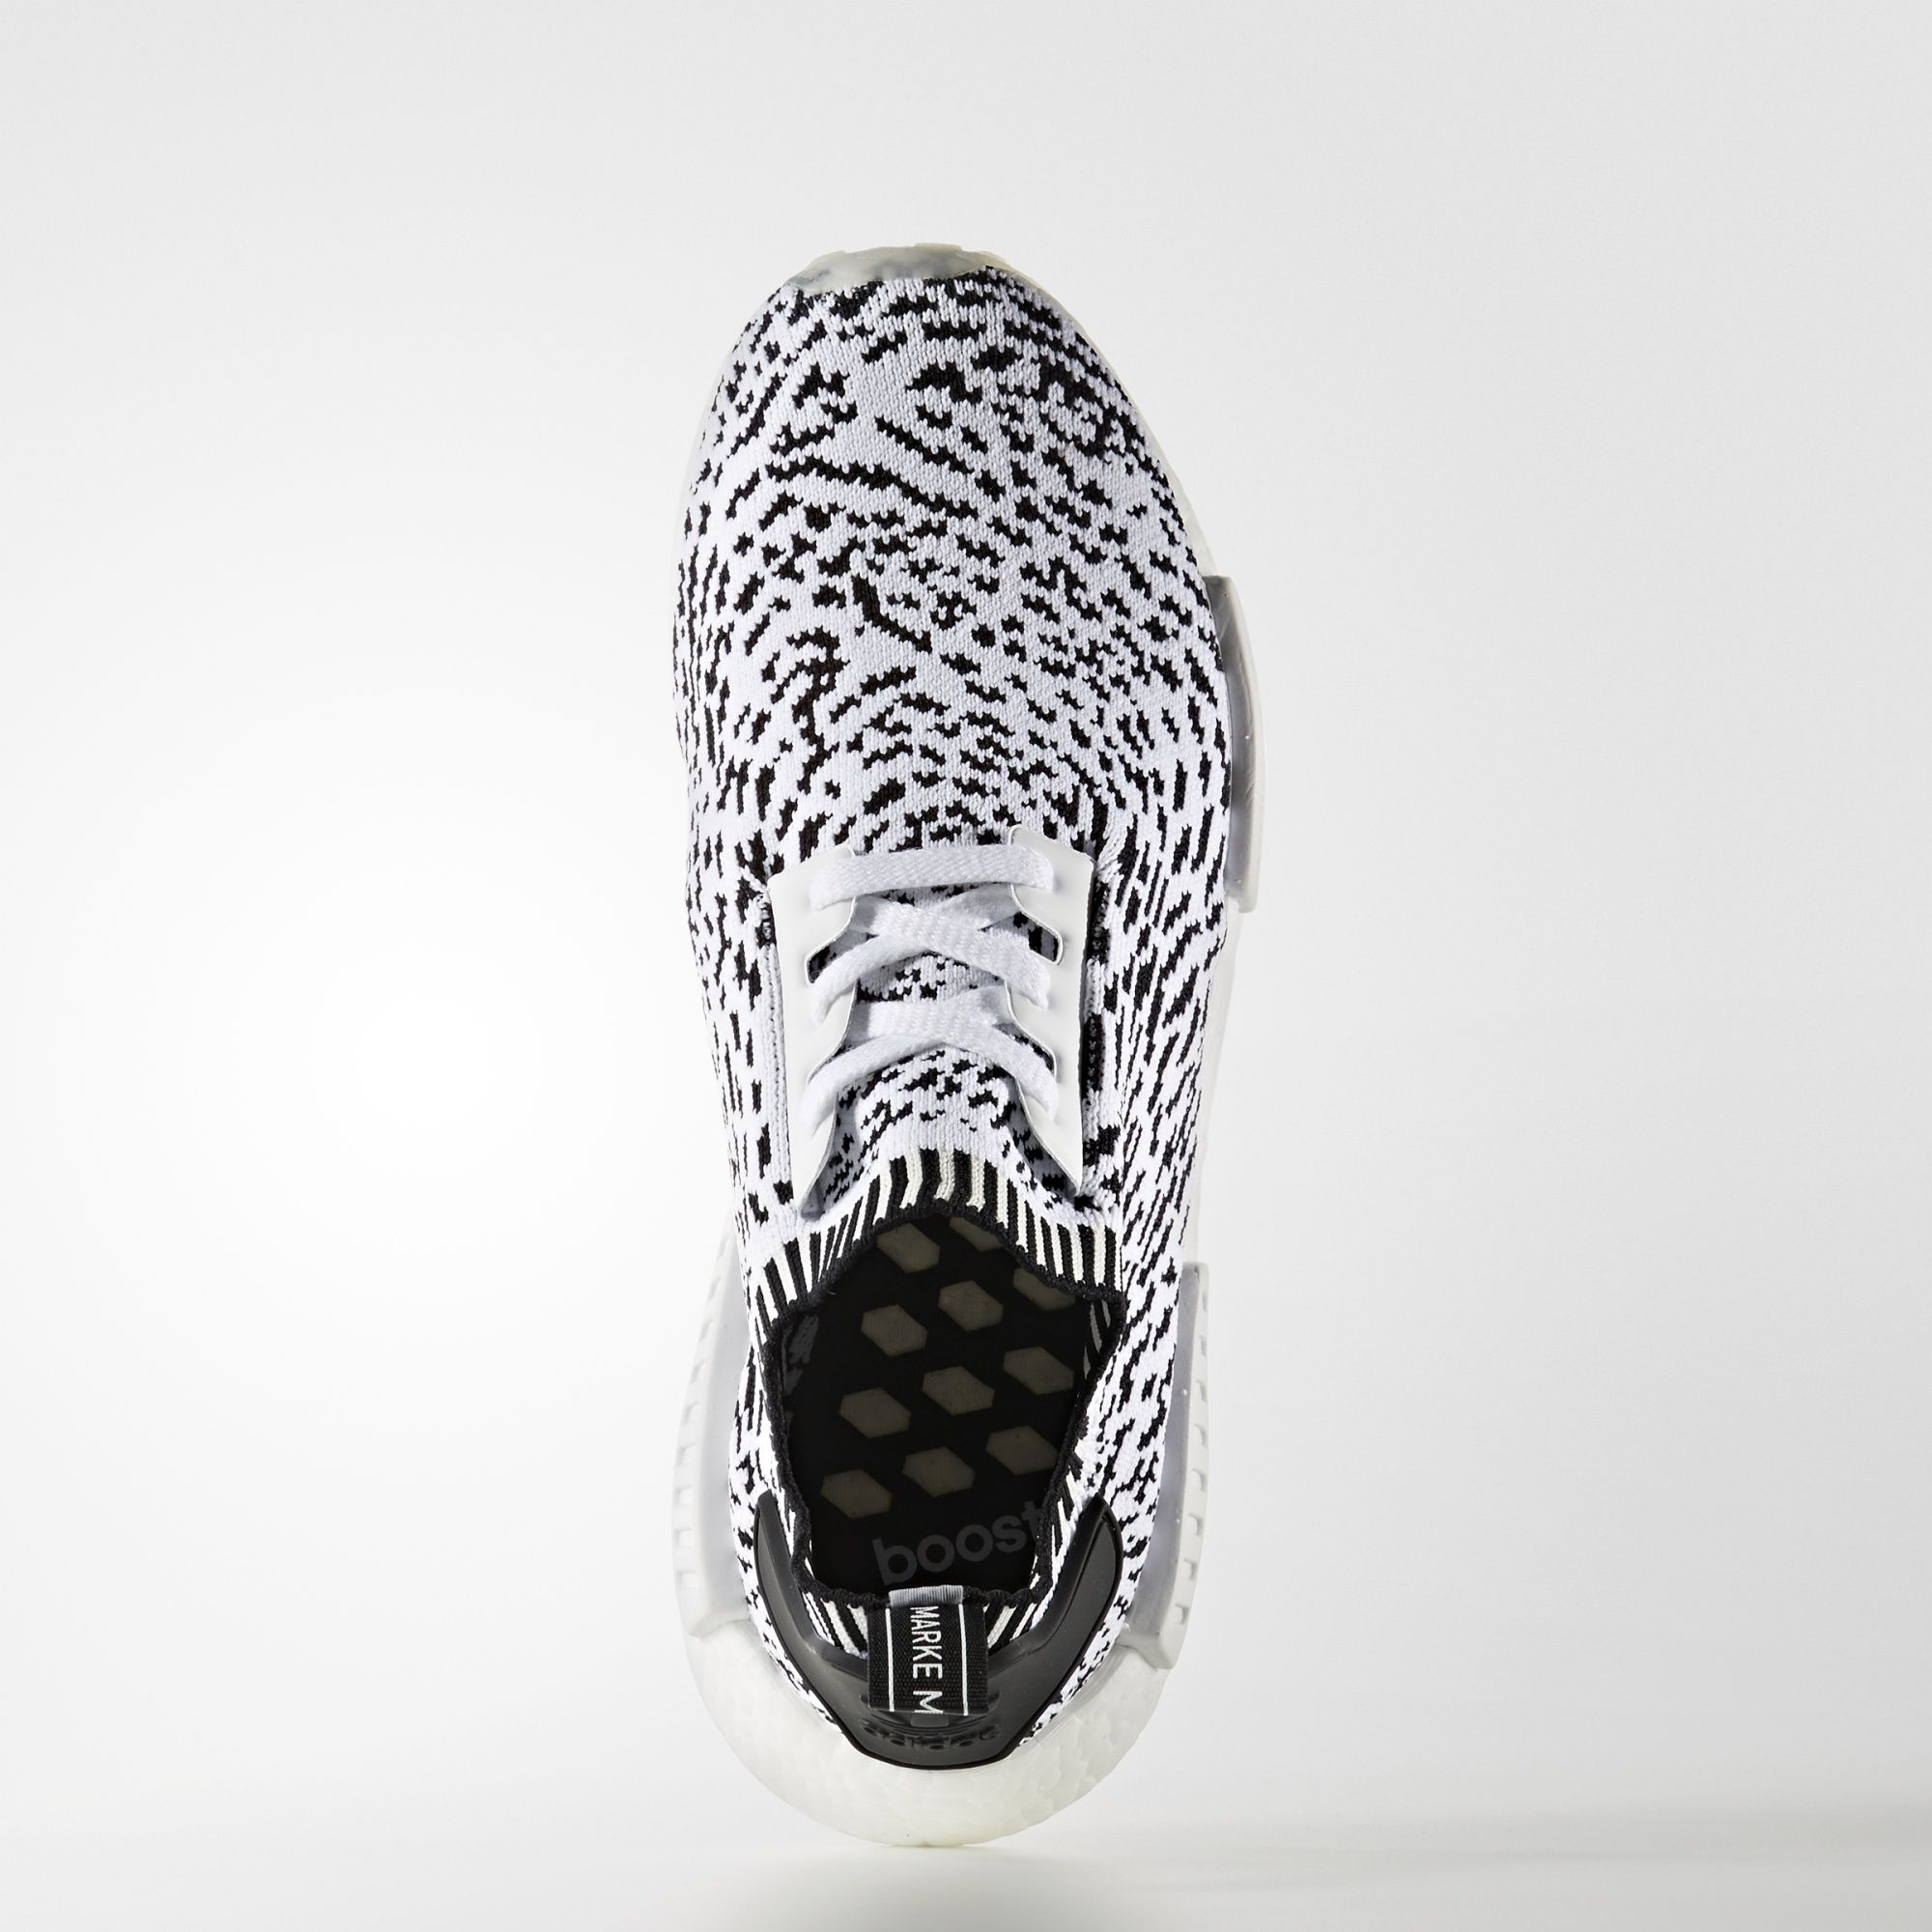 BZ0219 adidas NMD R1 Primeknit White Black 1